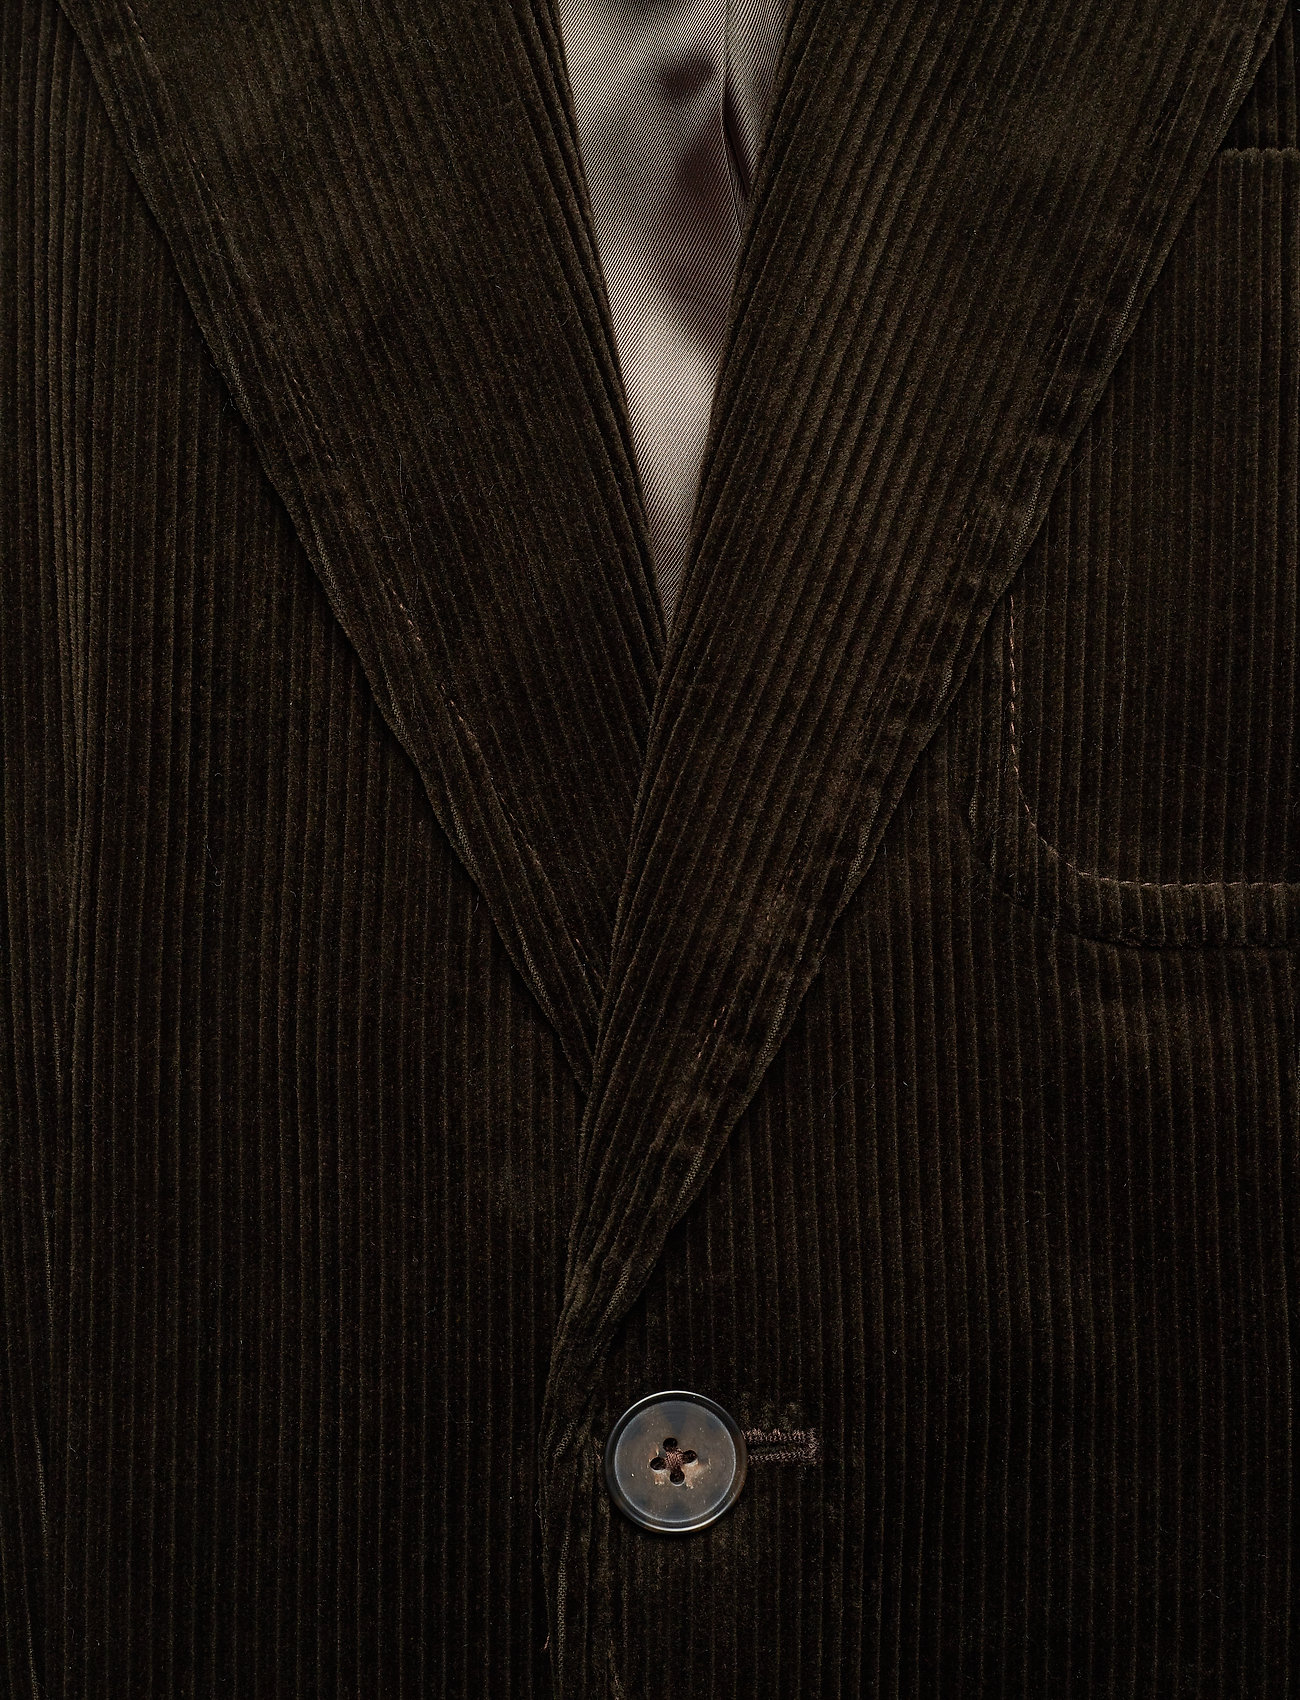 Cord-lnd-blz (Antique Brown) (2219.40 kr) - Polo Ralph Lauren